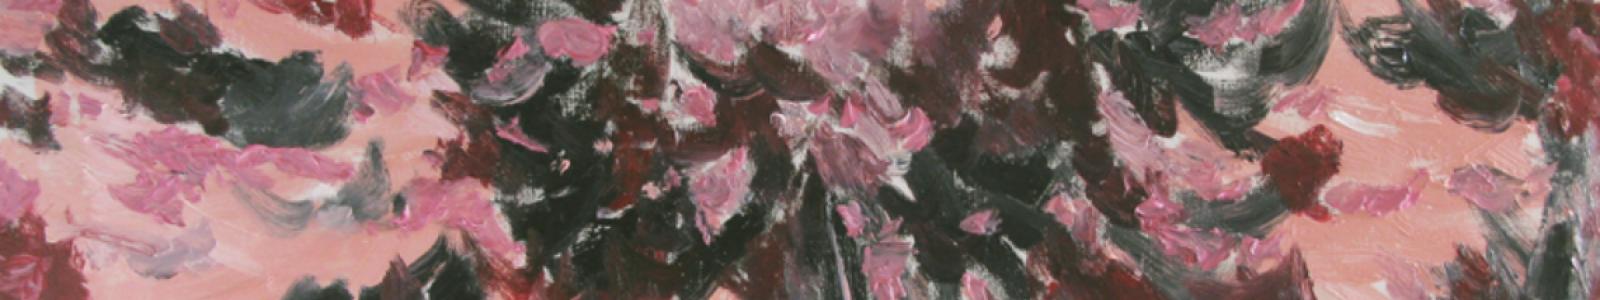 Gallery Painter Andrey Vishnevskiy